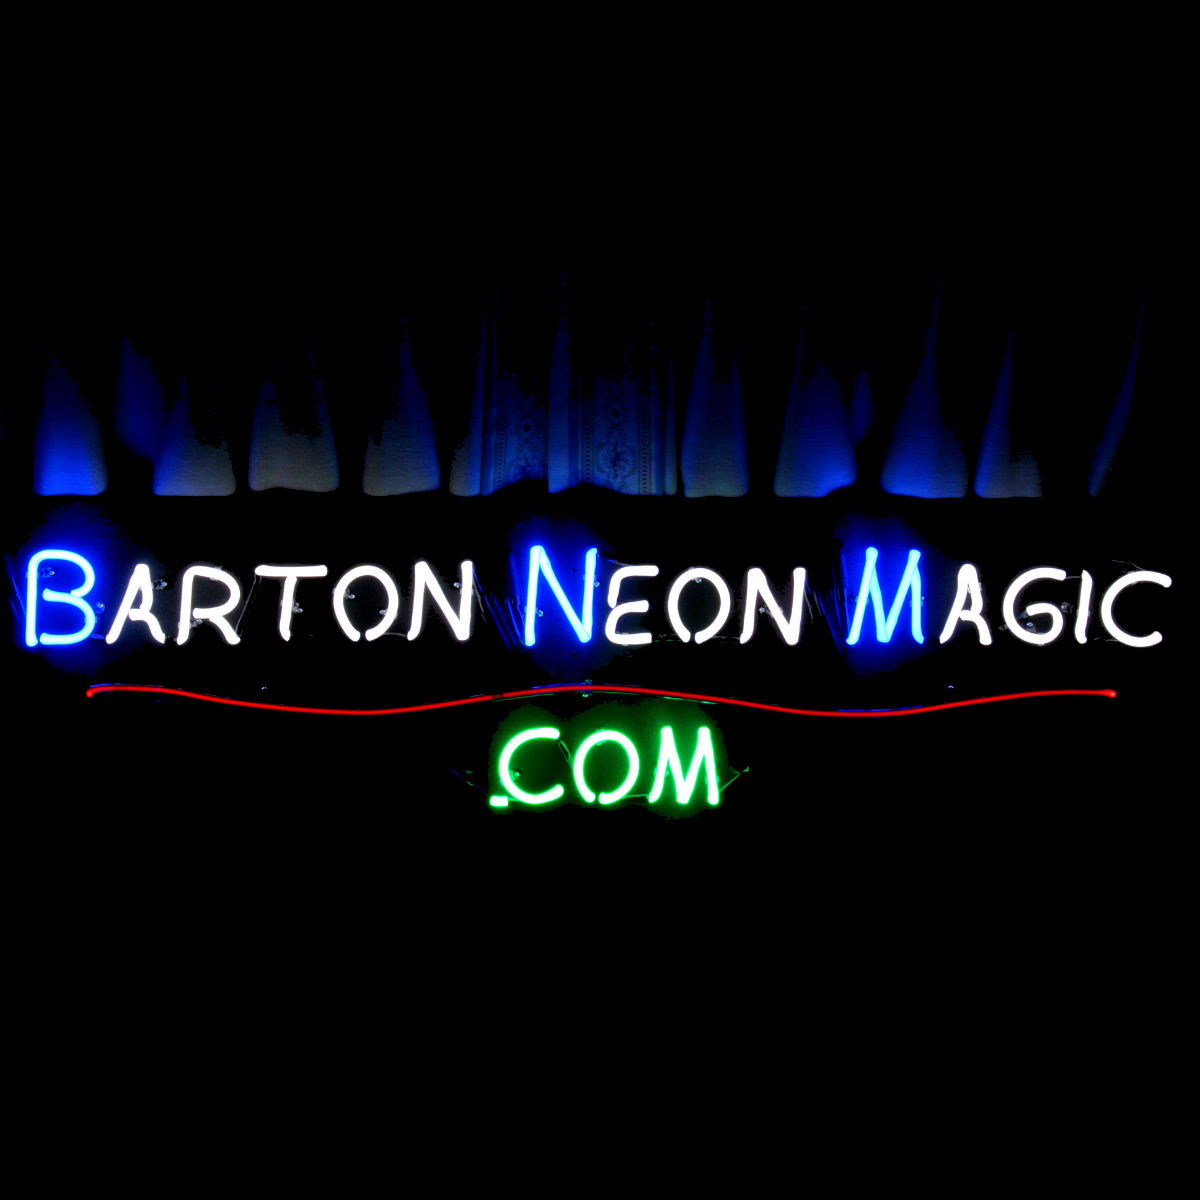 Designer Neon Artworks by John Barton - BartonNeonMagic.com